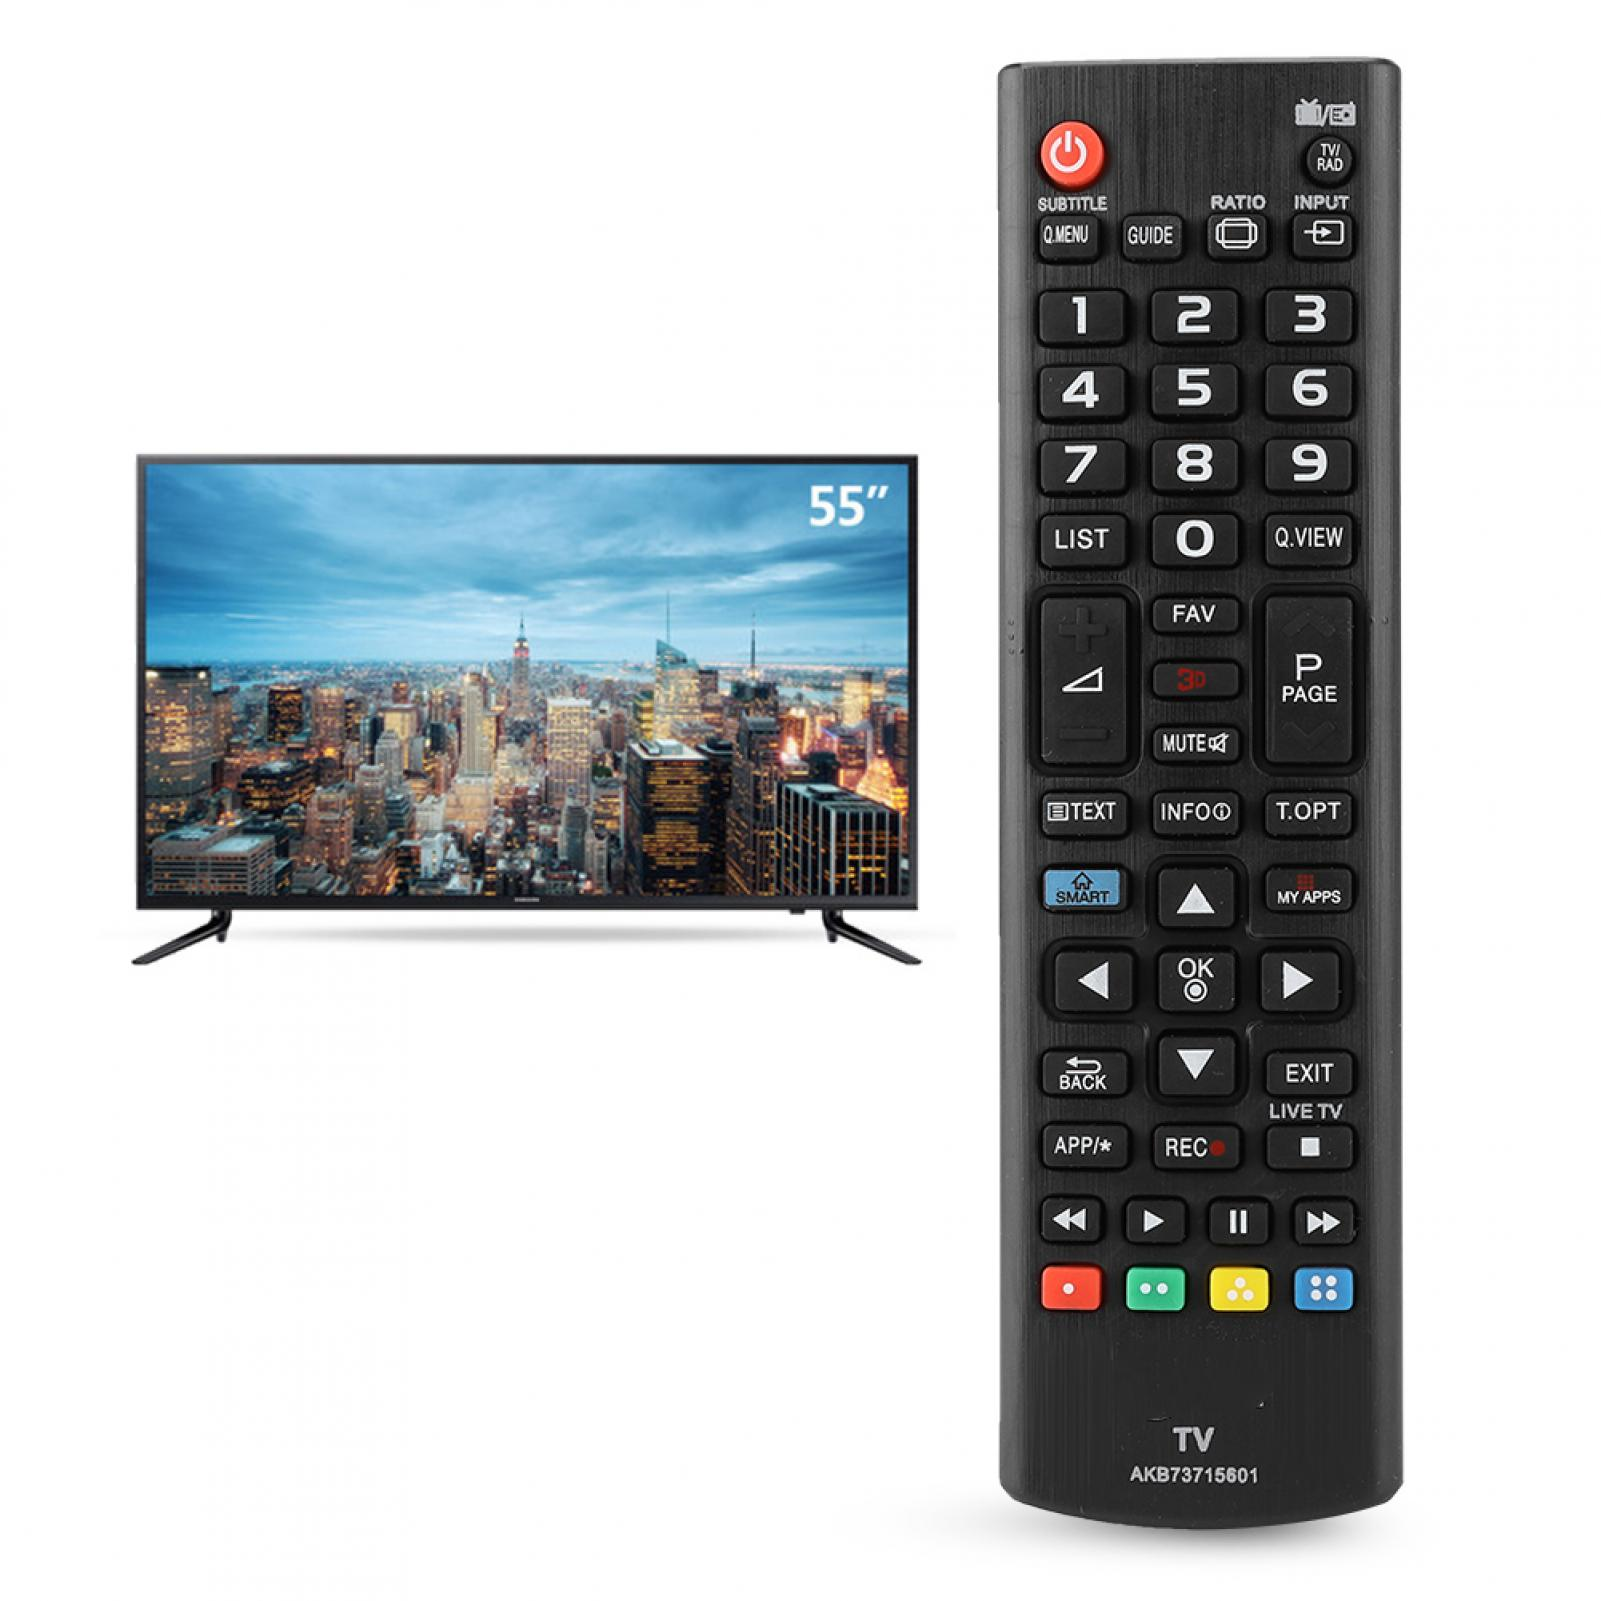 DEHA TV Remote Control for LG 55LE5310 Television